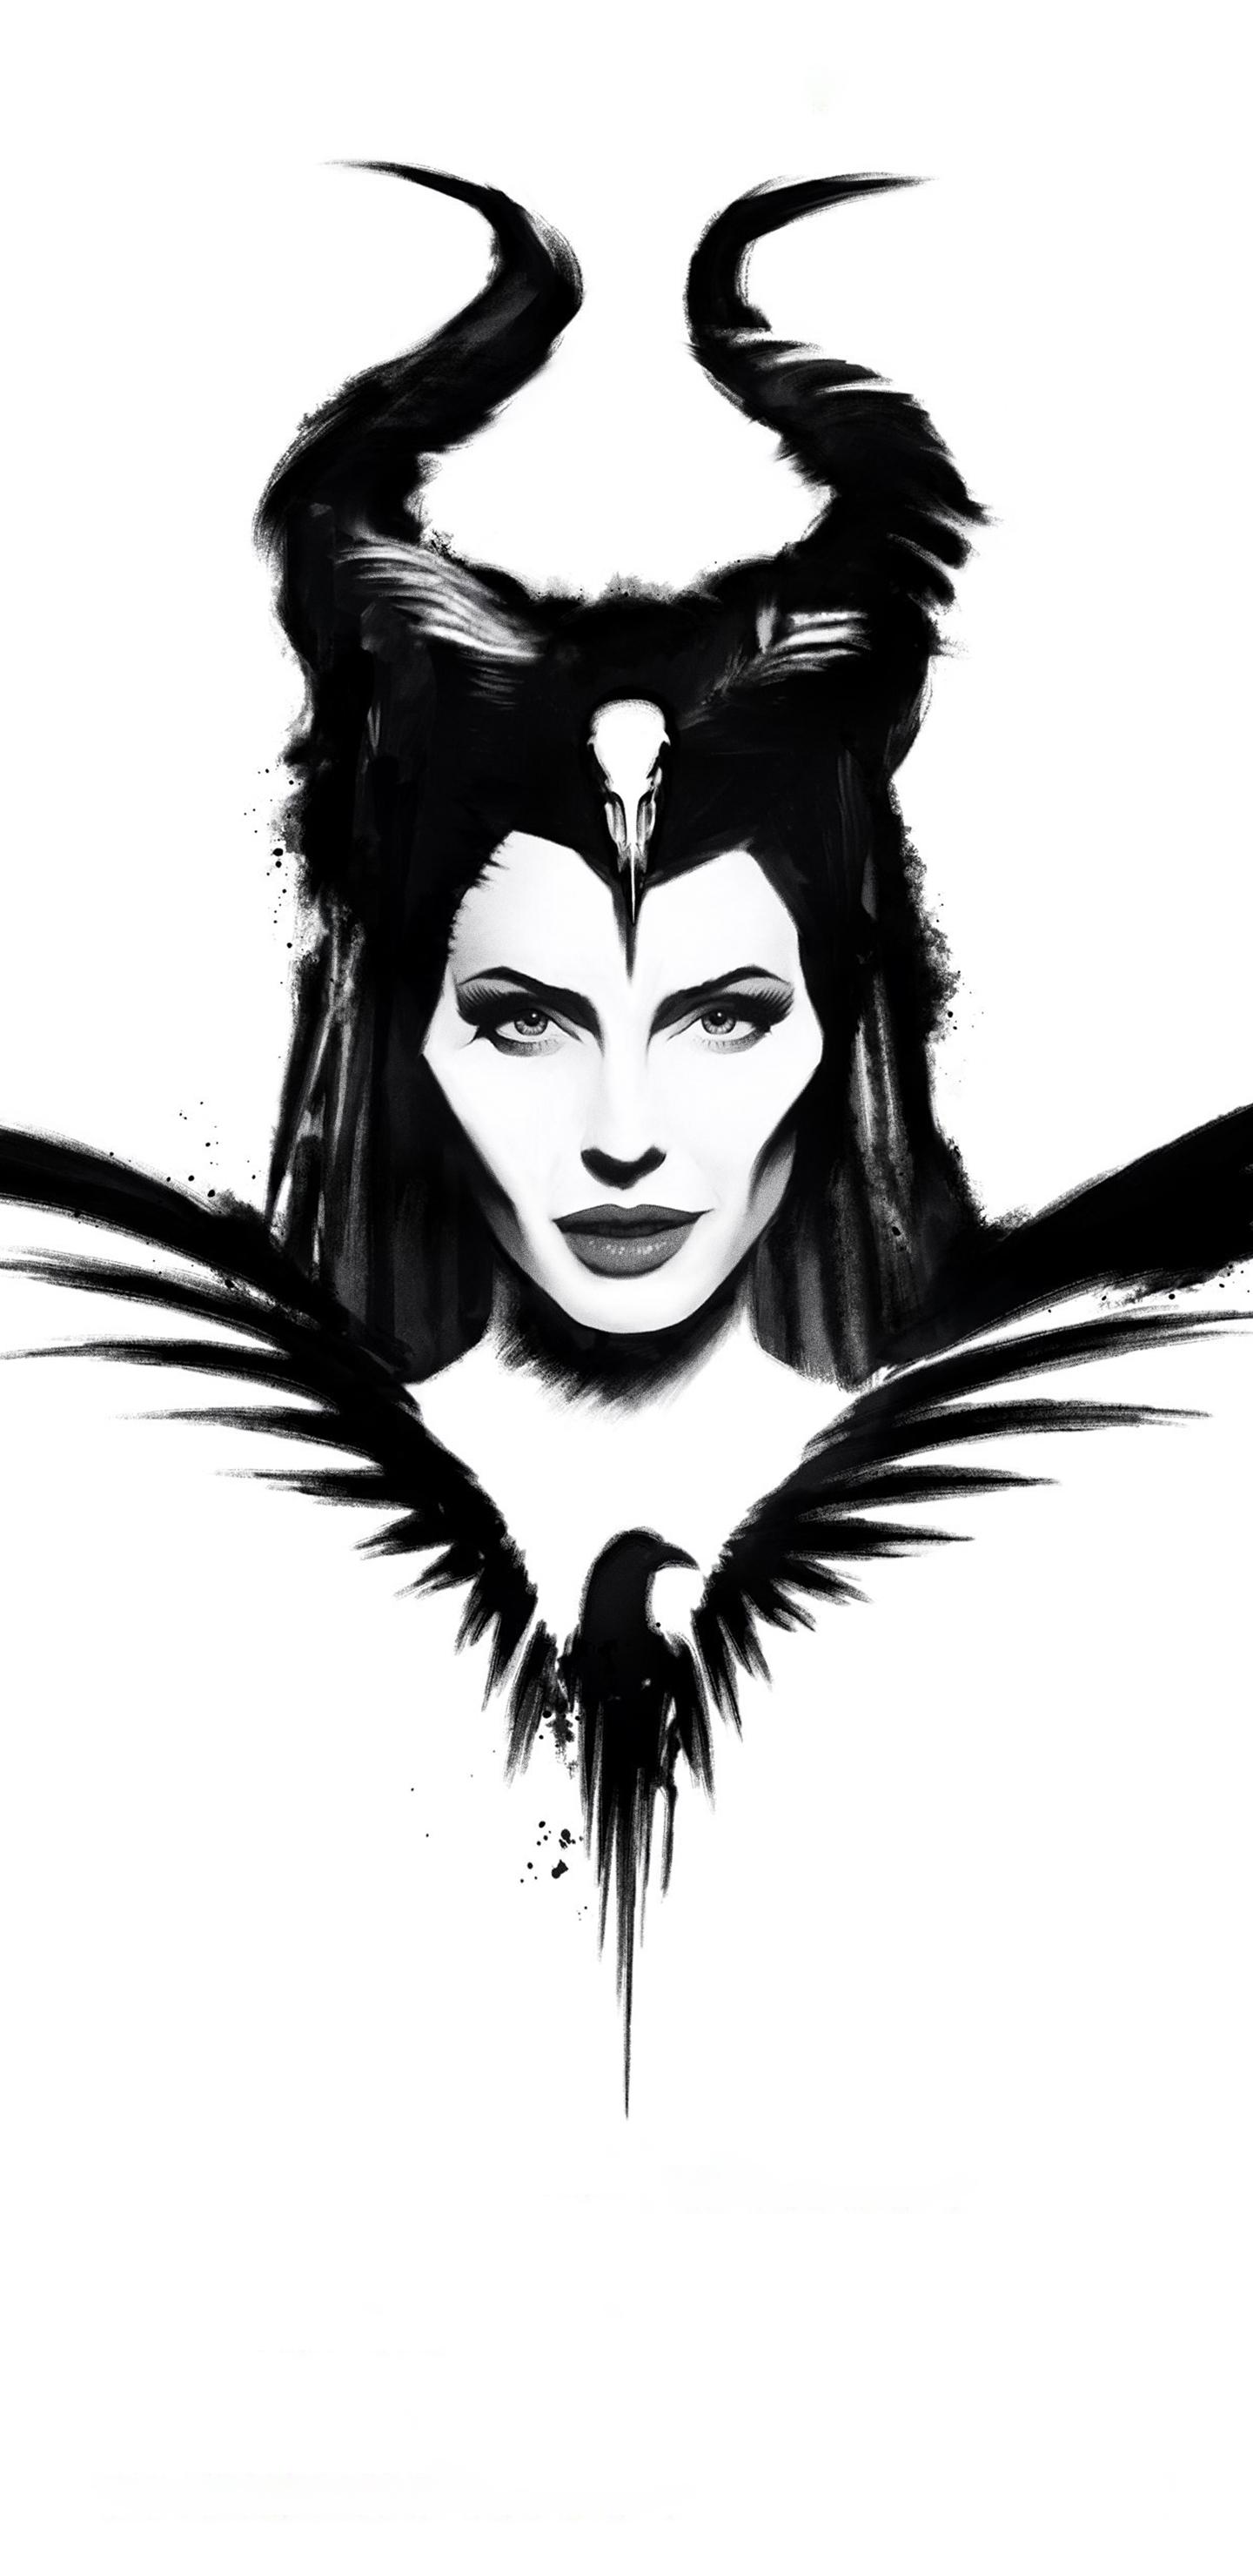 maleficent-mistress-of-evil-poster-4k-kz.jpg